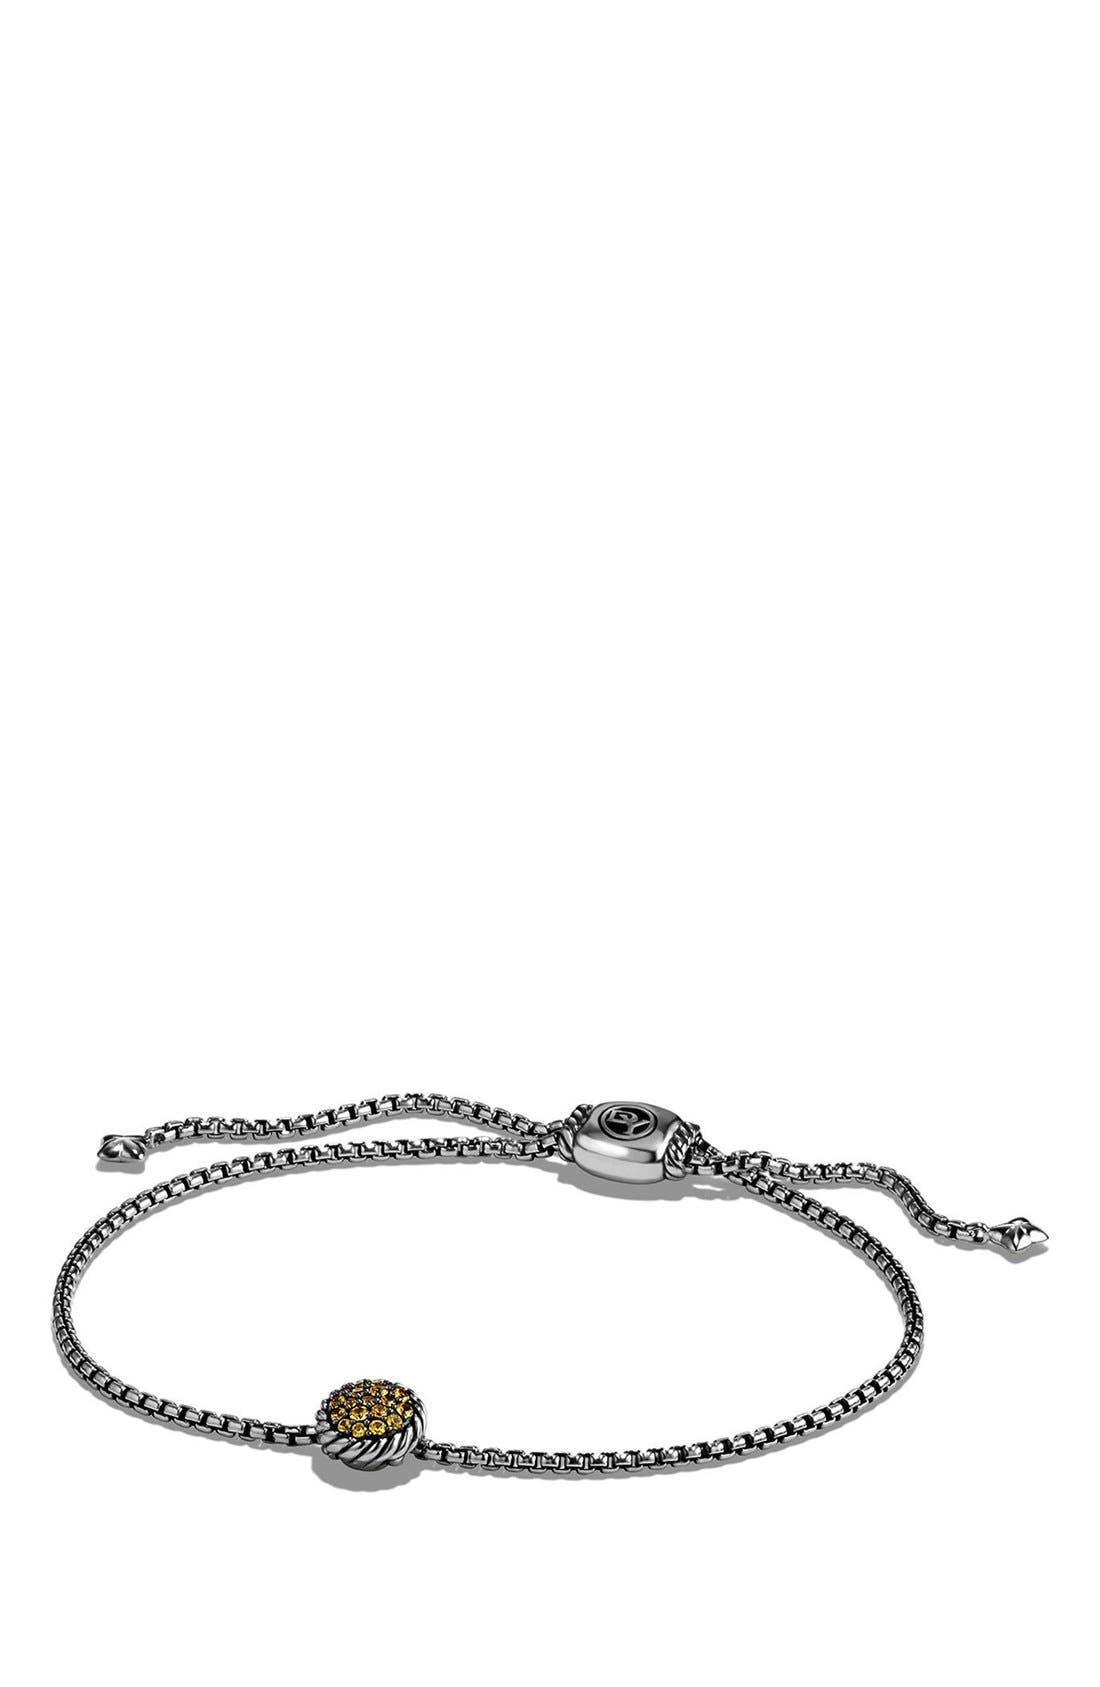 Main Image - David Yurman 'Châtelaine' Petite Bracelet